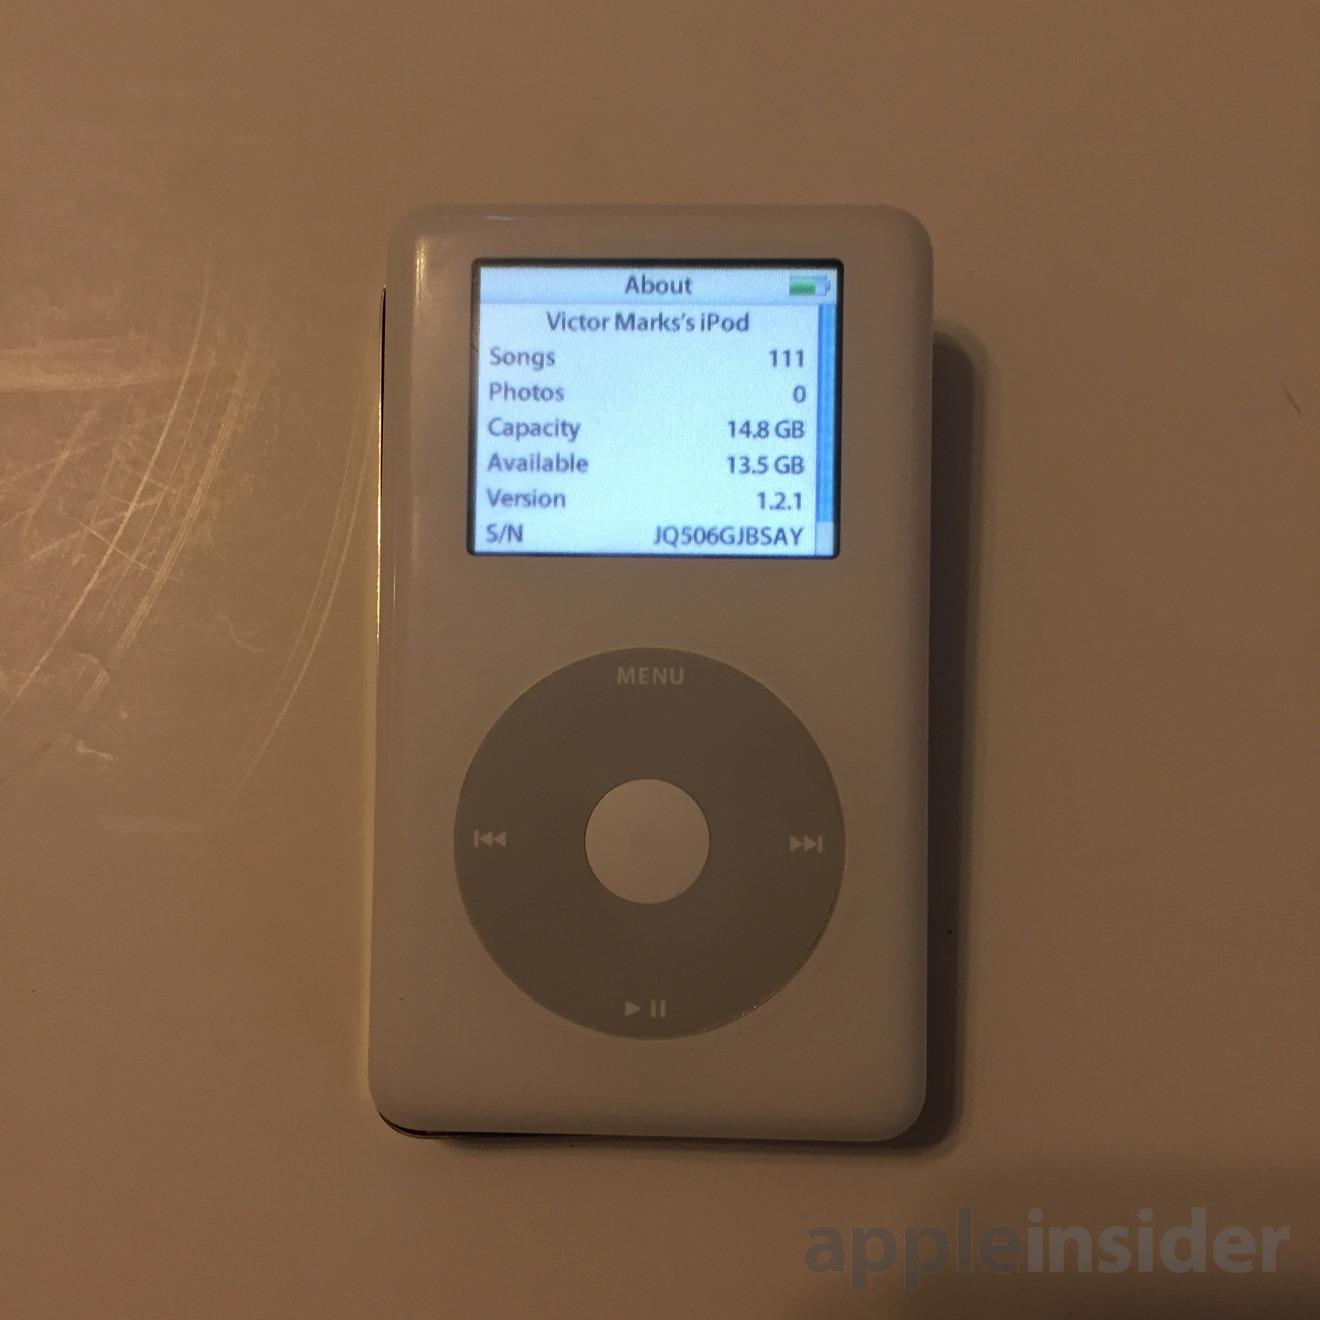 Apple iPod Classic in white